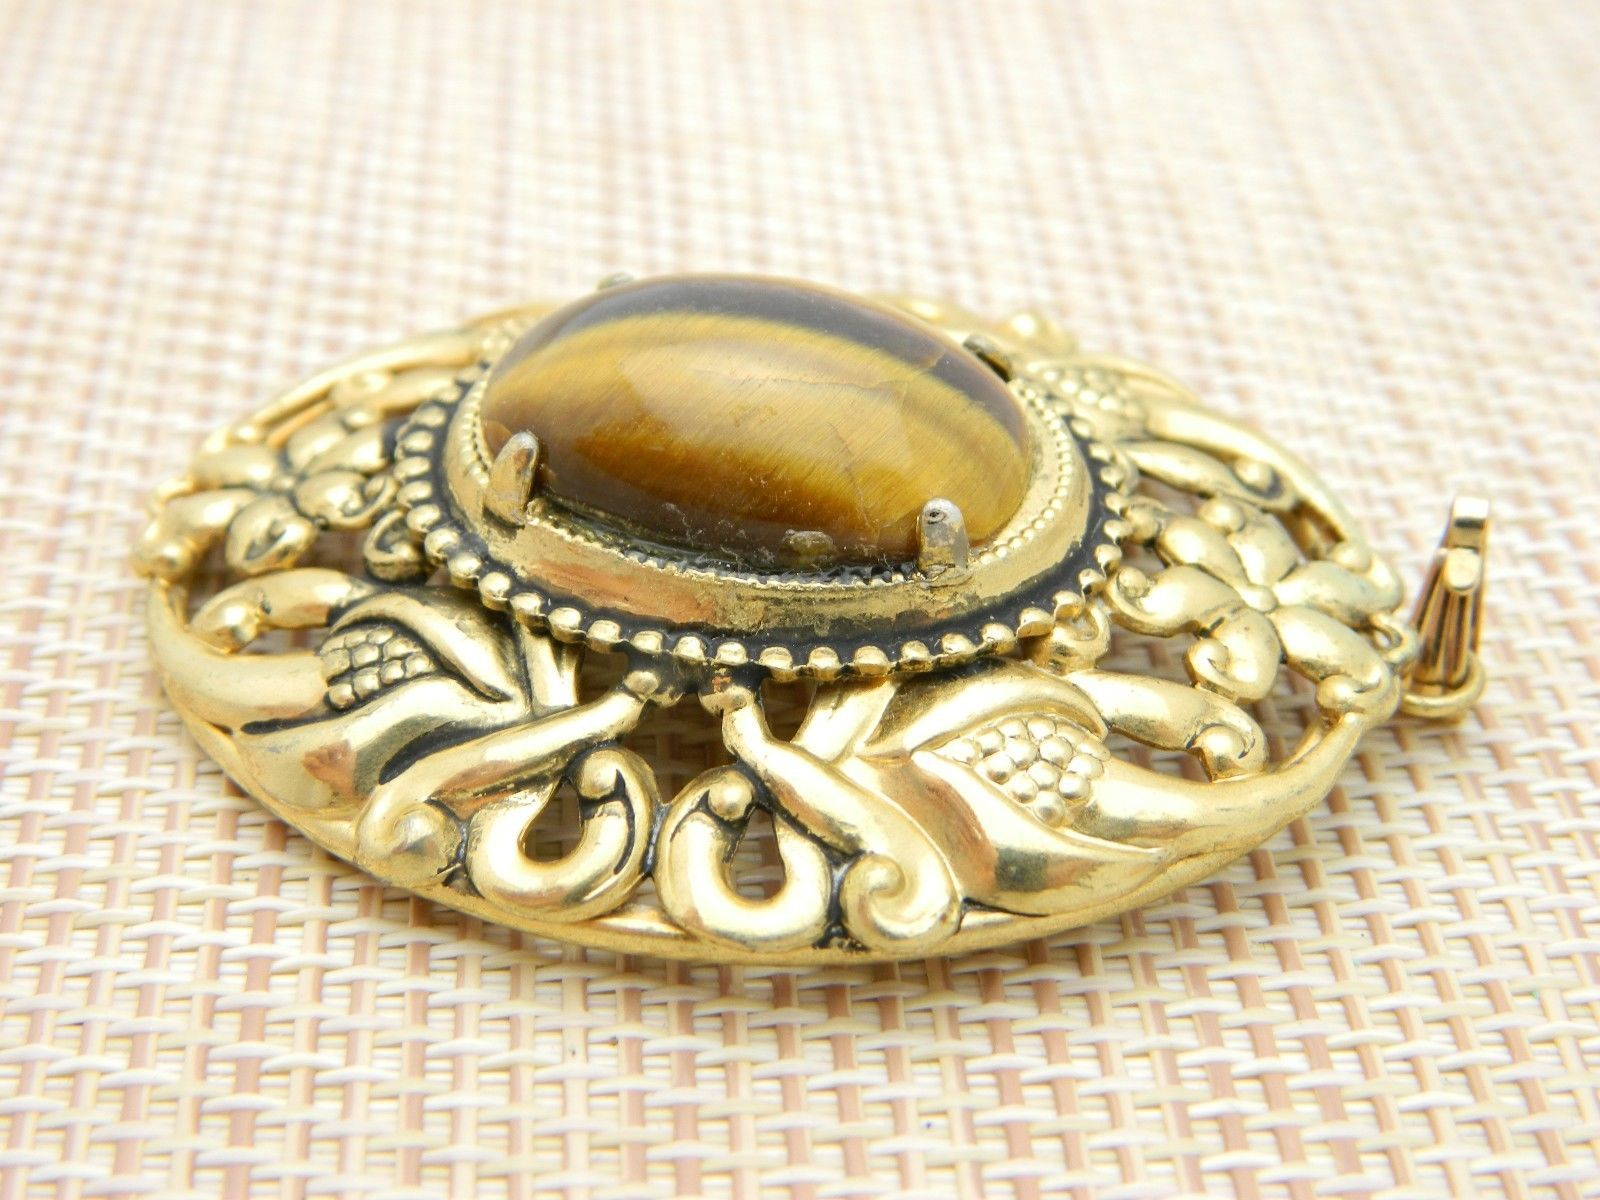 Tiger's Eye Gold Tone Repousse Necklace Pendant Vintage image 3